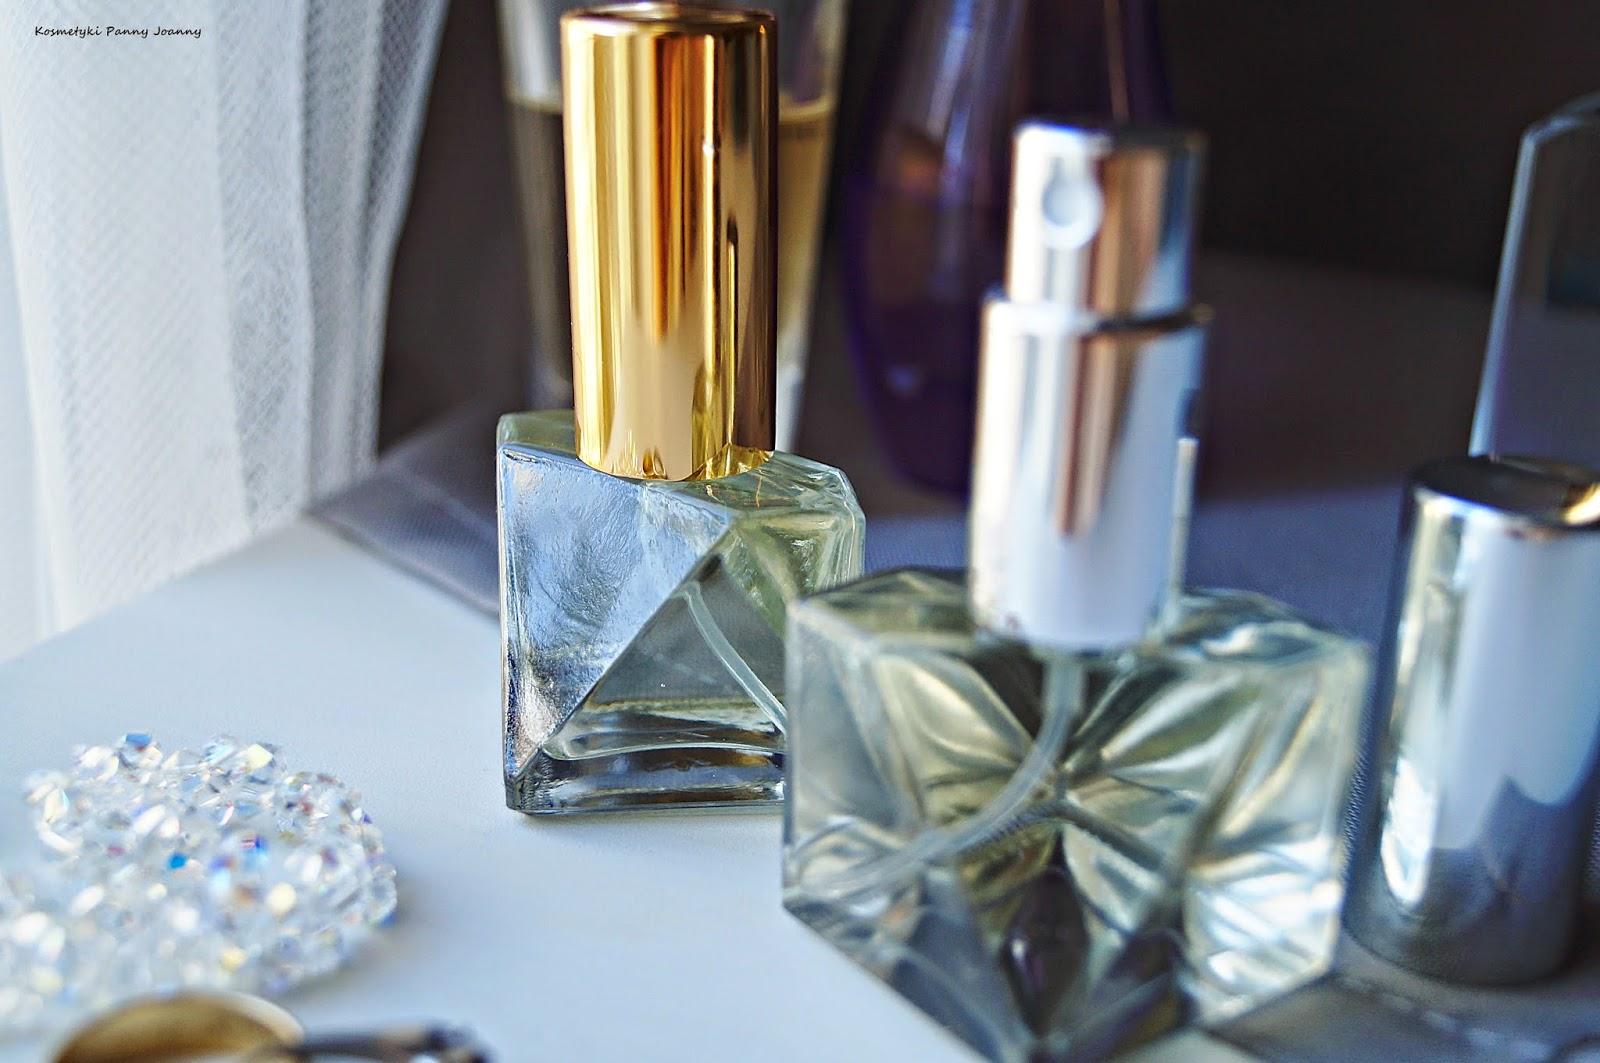 Zamienniki sławnych, drogich perfum - perfumy Orlean